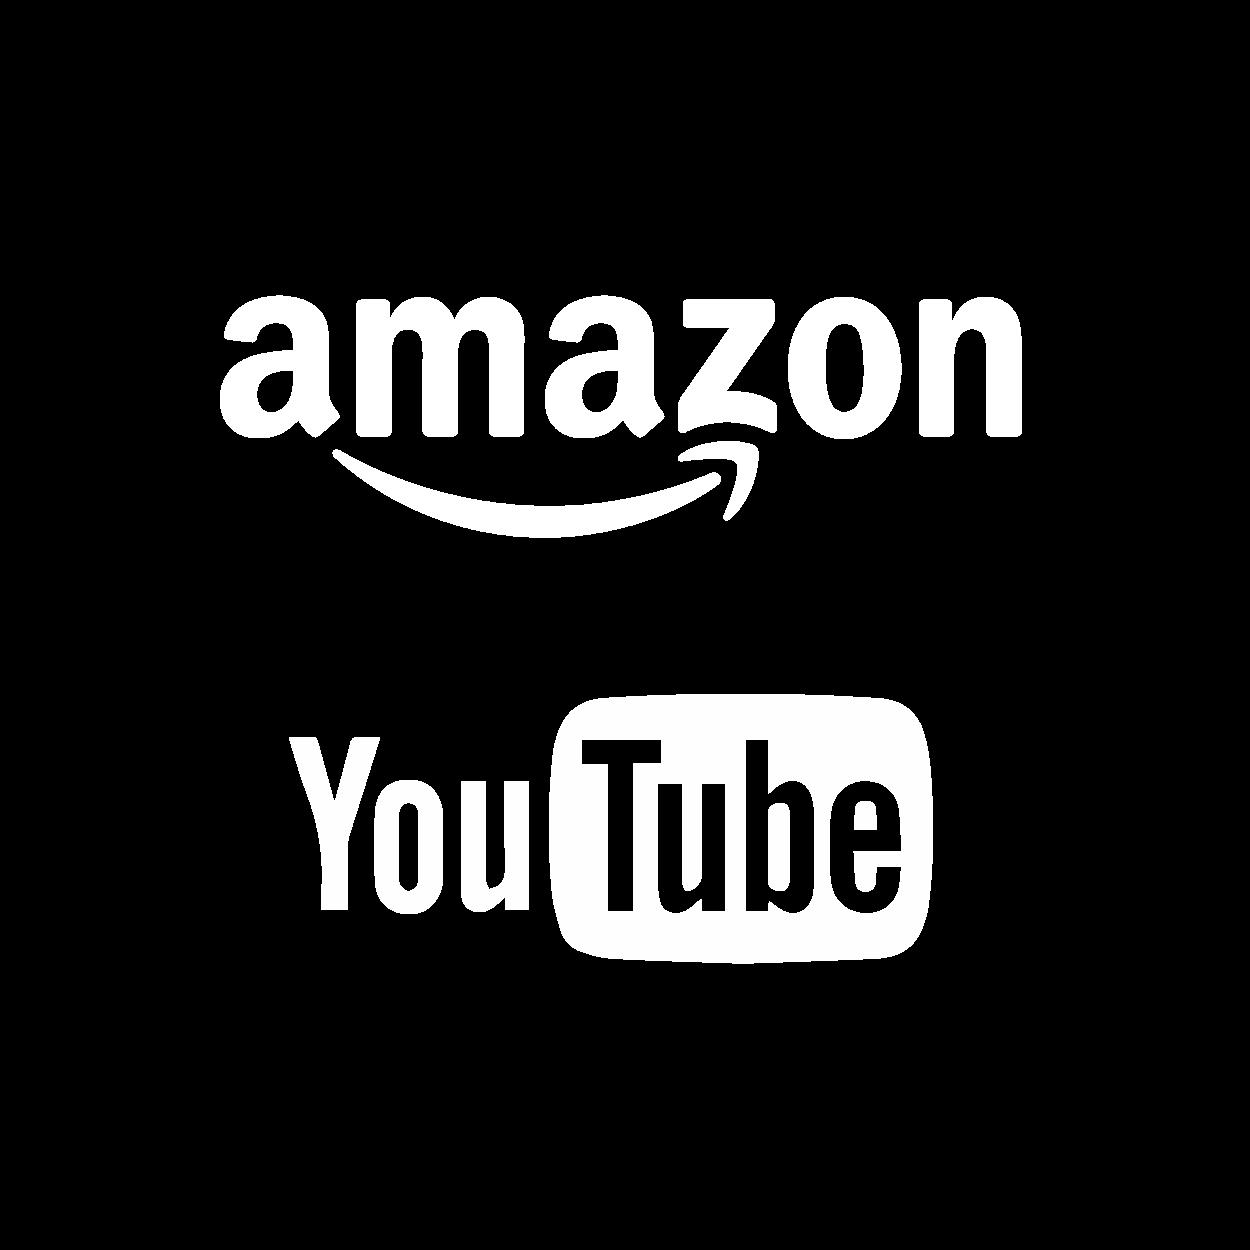 amazon youtube logo